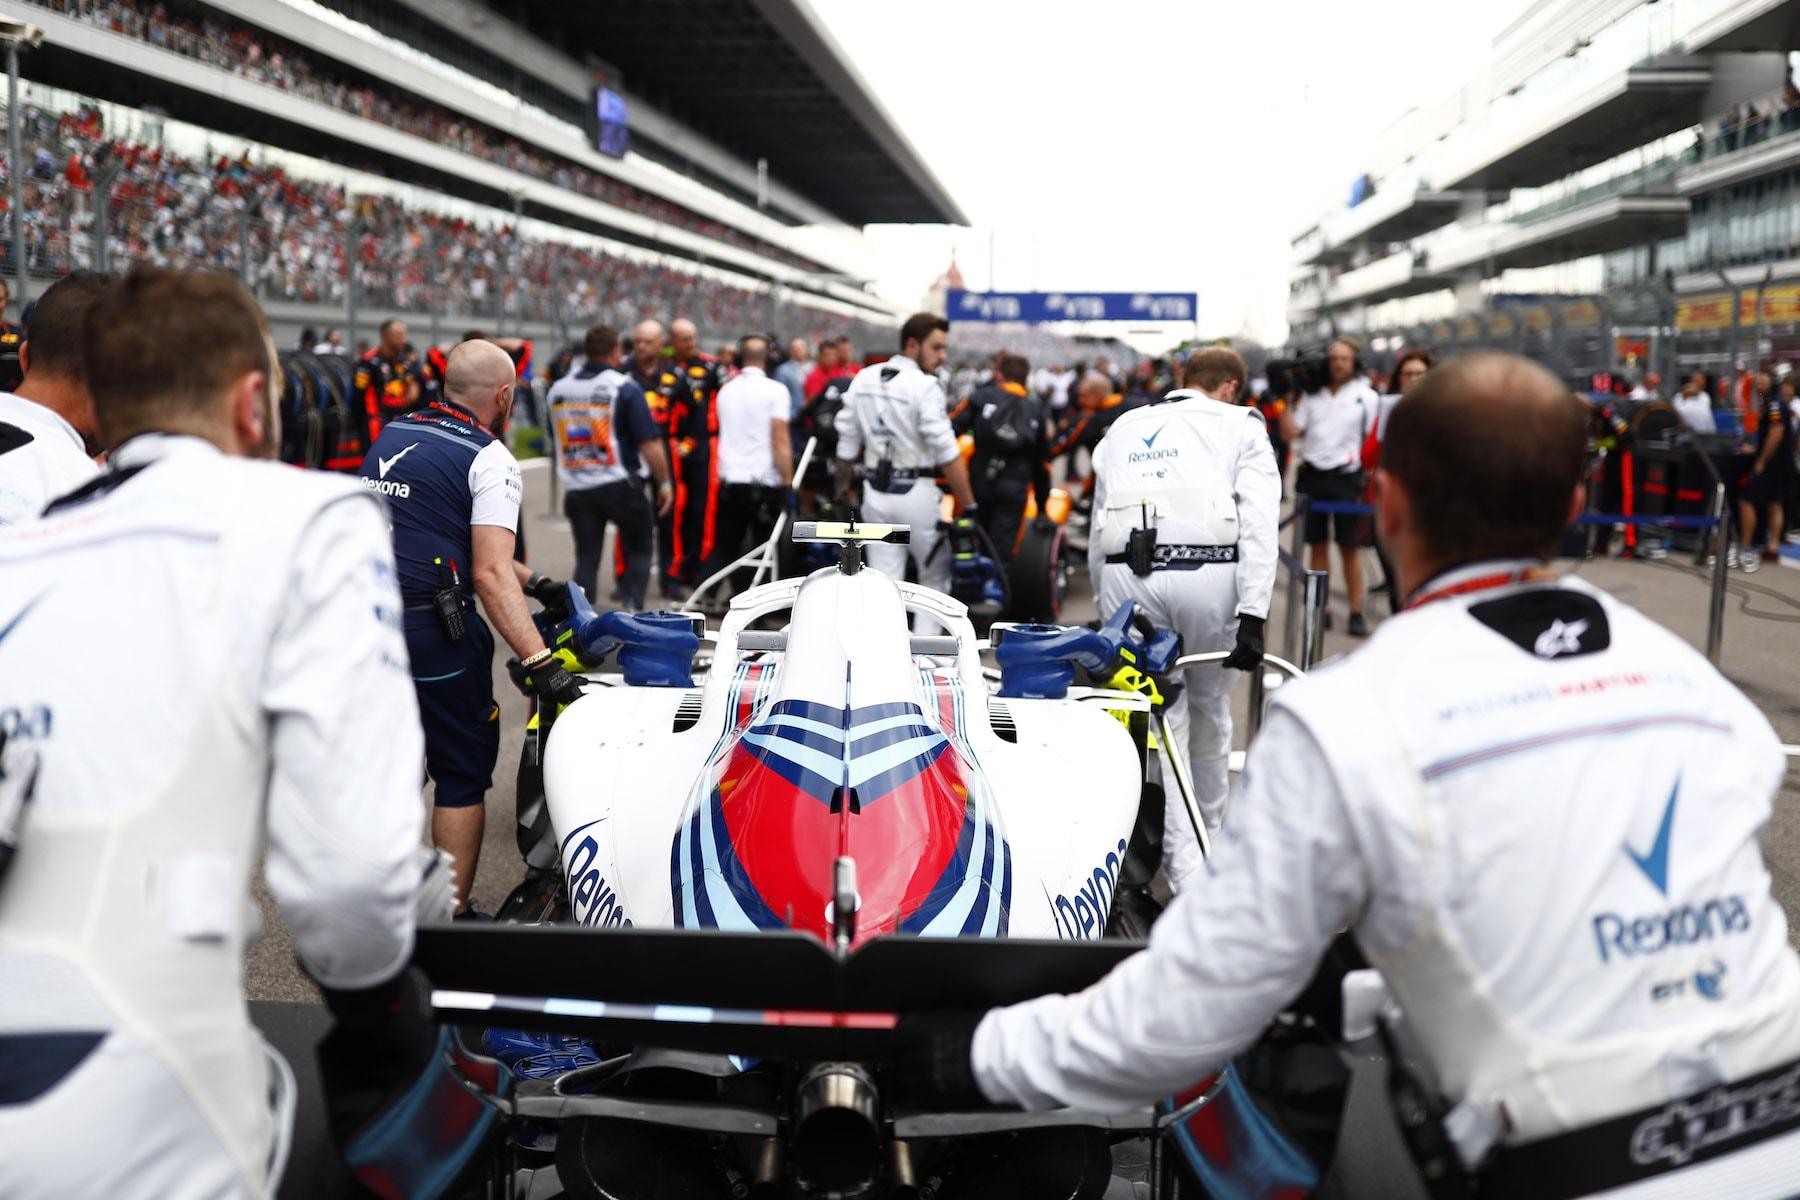 B 2018 Sergey Sirotkin | Williams FW41 | 2018 Russian GP 1 copy.jpg